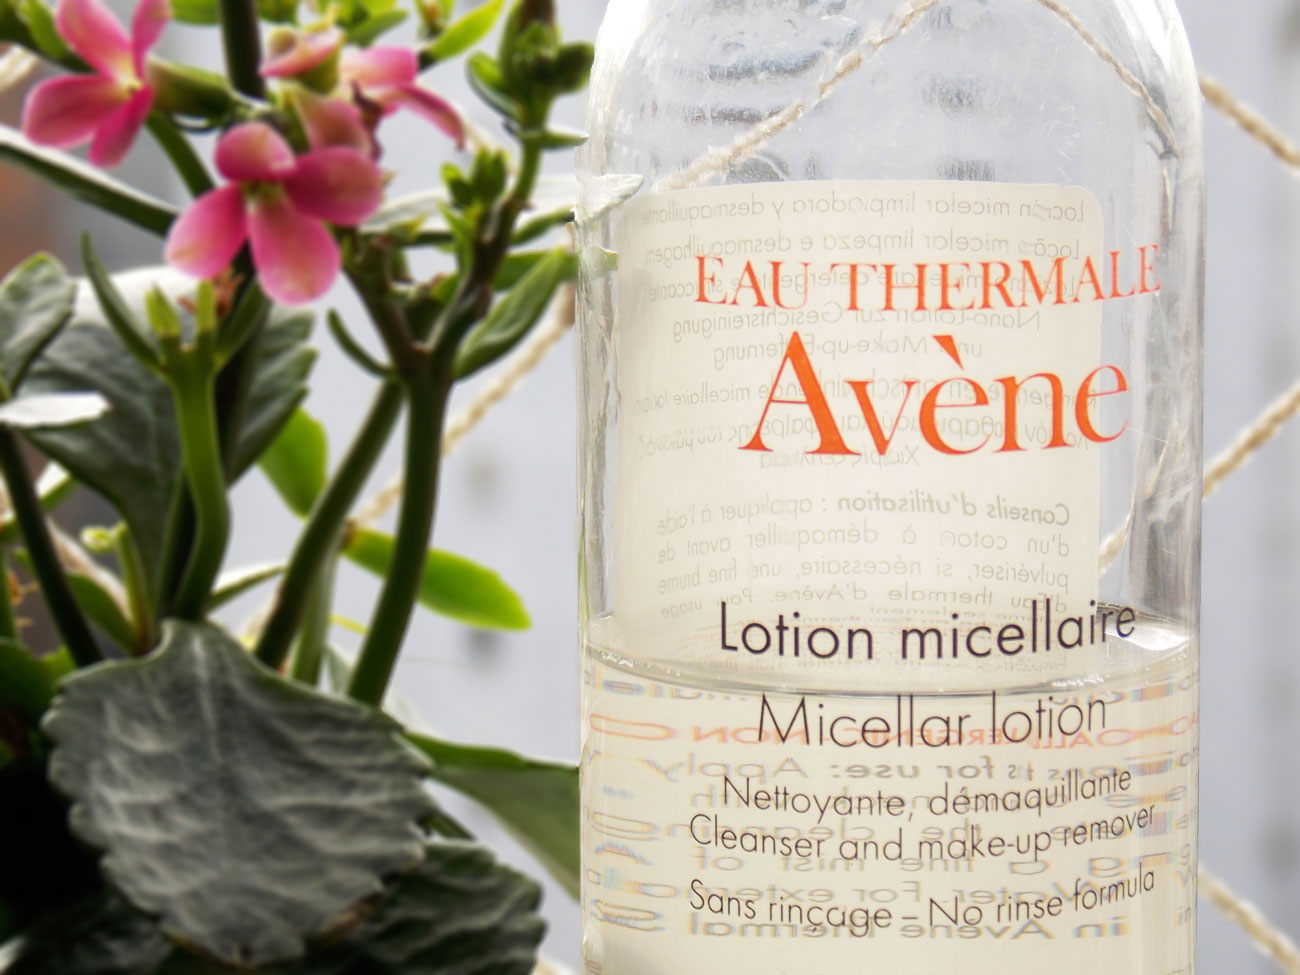 Reseña: Avène micellar lotion